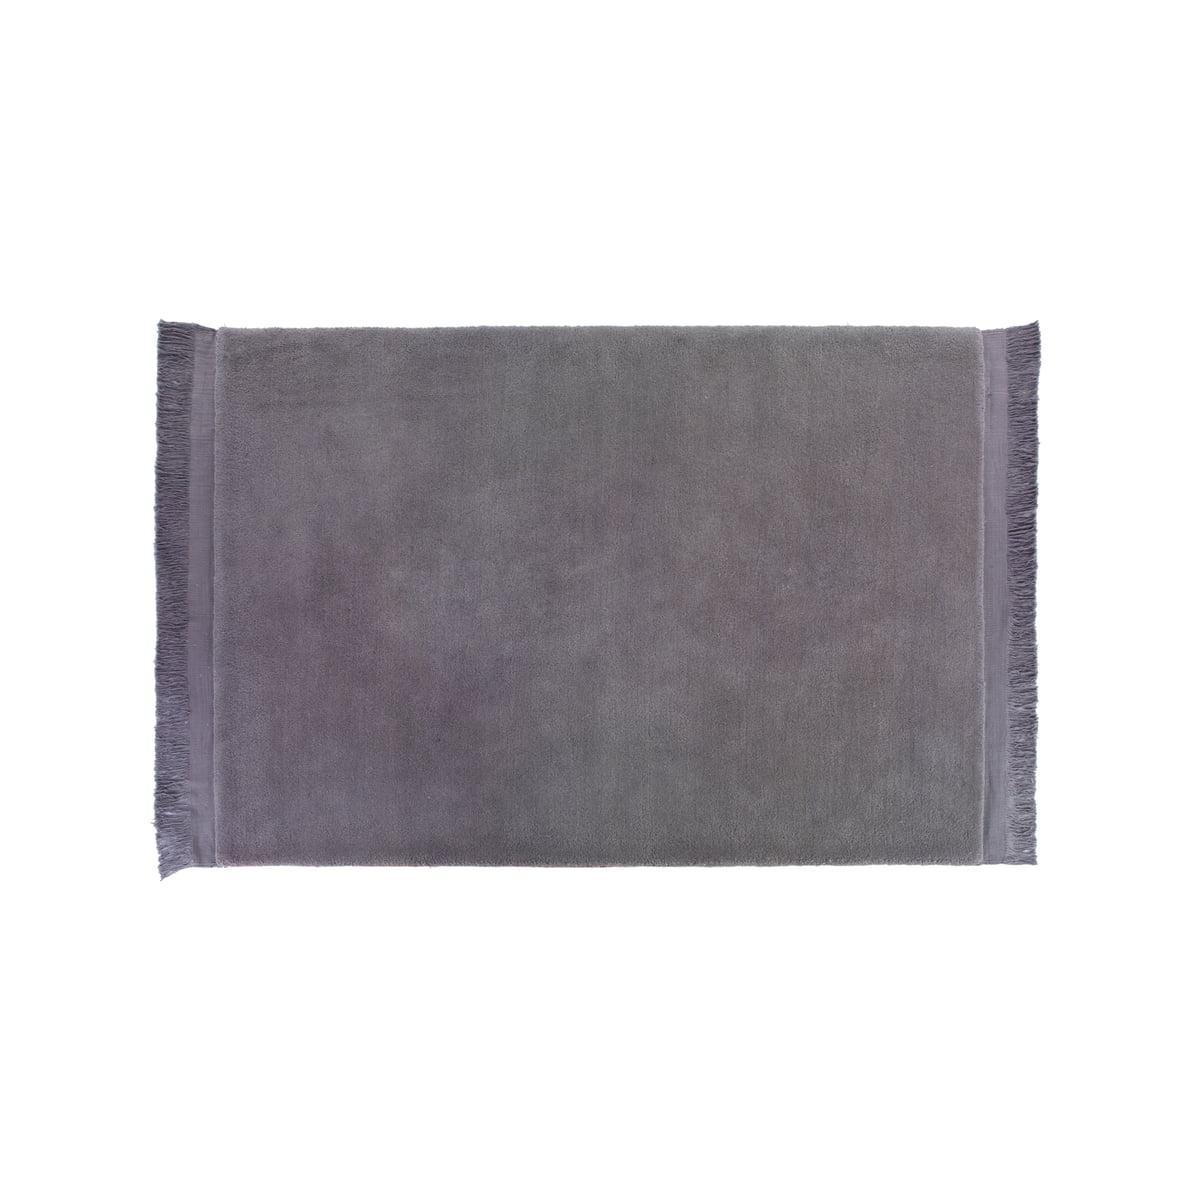 hay raw teppich 140 x 200 cm grau grau t 140 b 200 online kaufen bei woonio. Black Bedroom Furniture Sets. Home Design Ideas